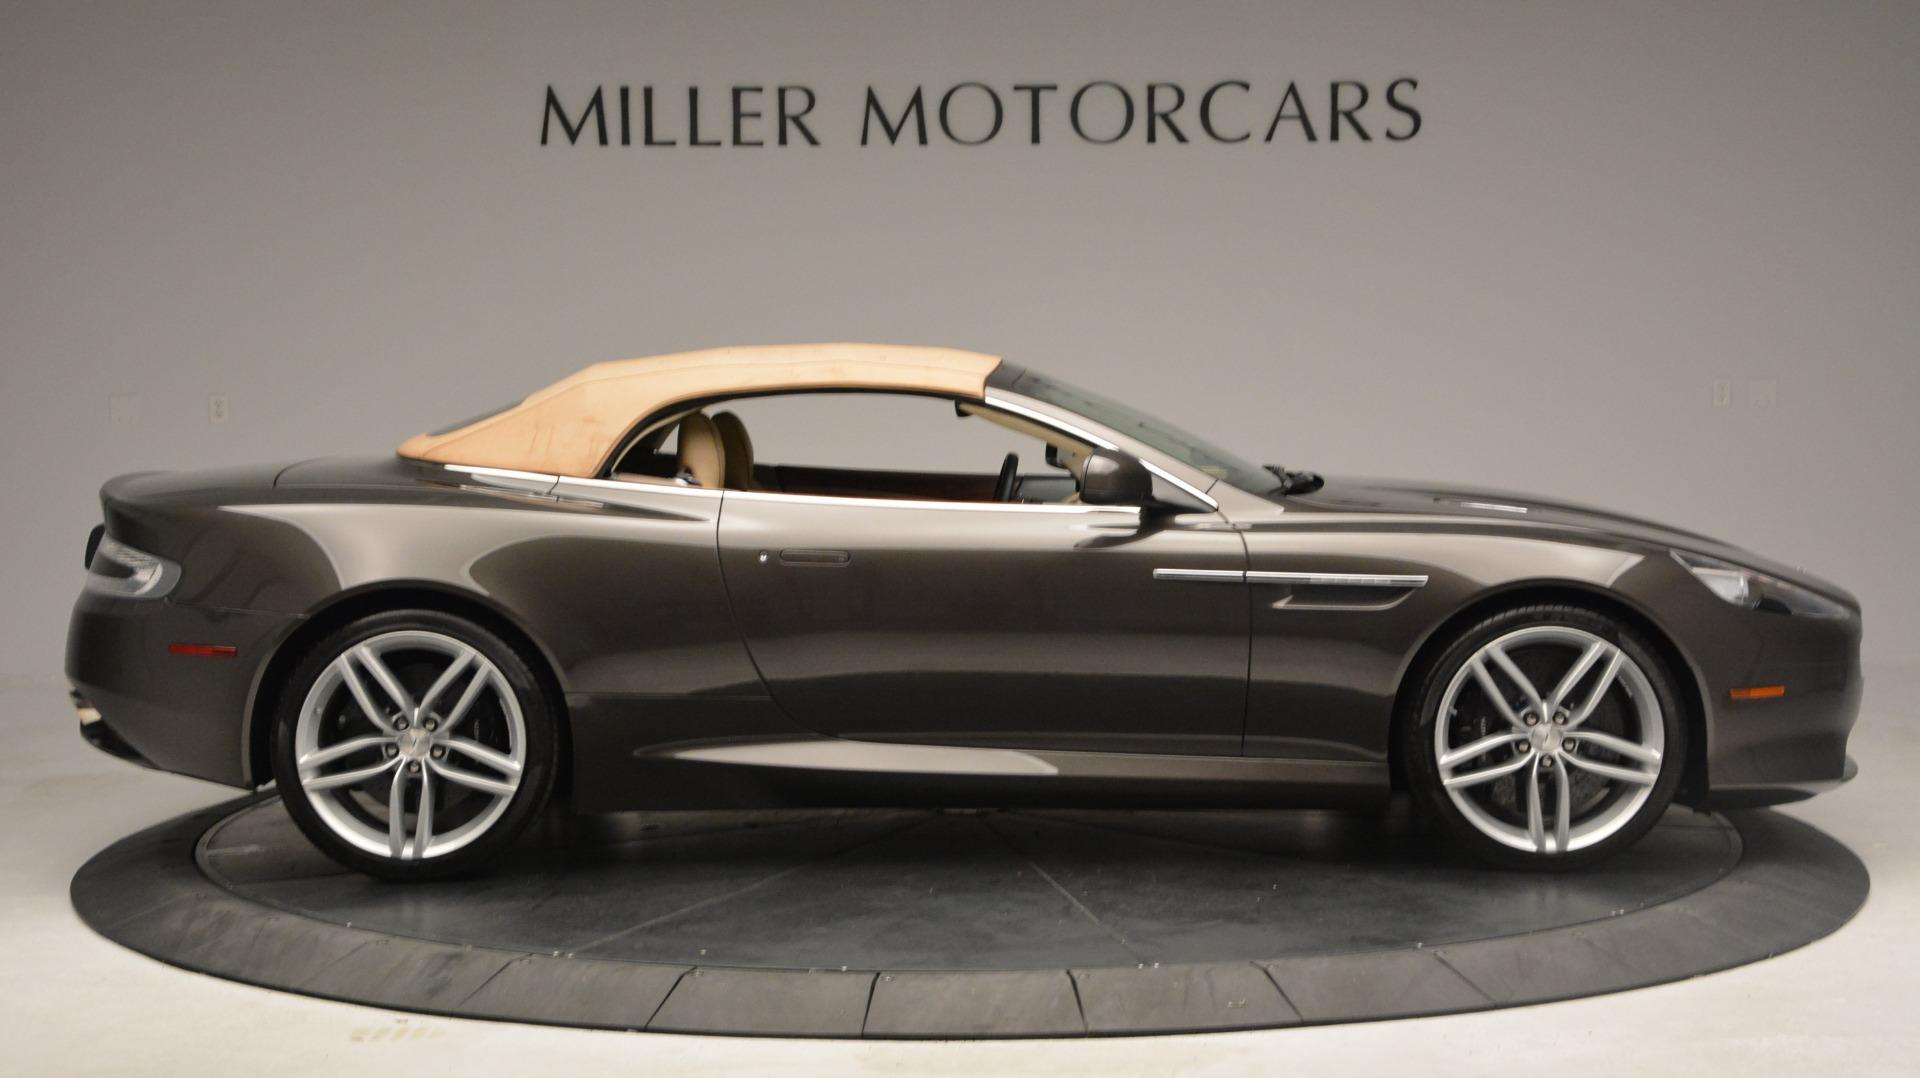 Used 2012 Aston Martin Virage Convertible For Sale In Greenwich, CT. Alfa Romeo of Greenwich, 7613 3351_p18